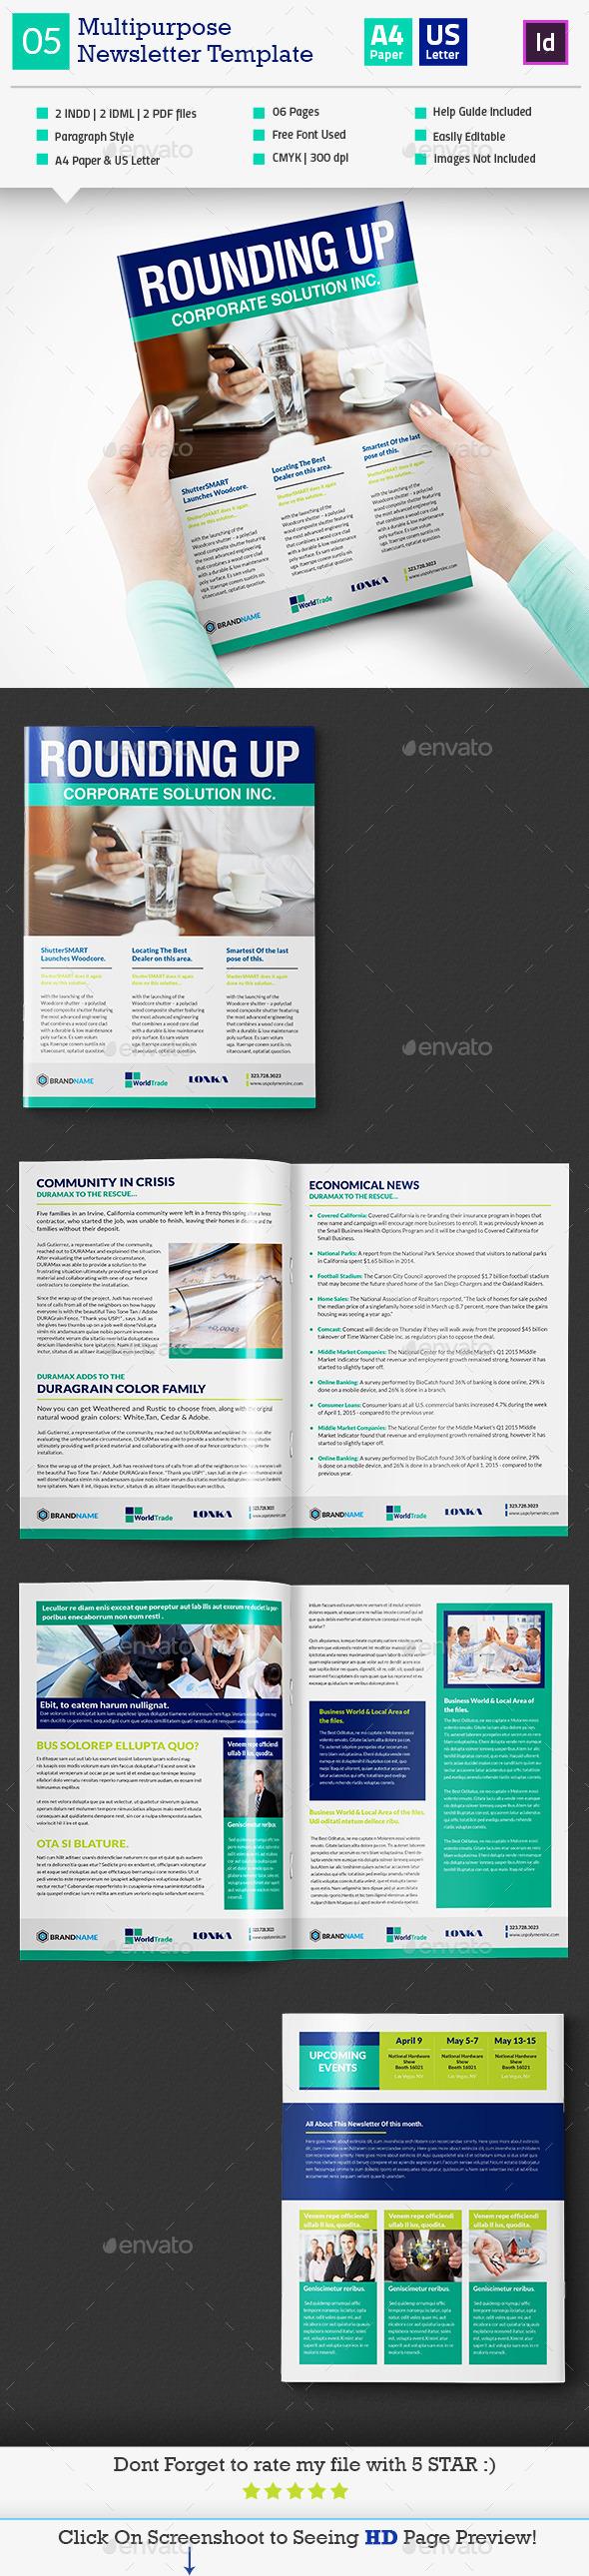 GraphicRiver Multipurpose Newsletter Template InDesign V5 11881033